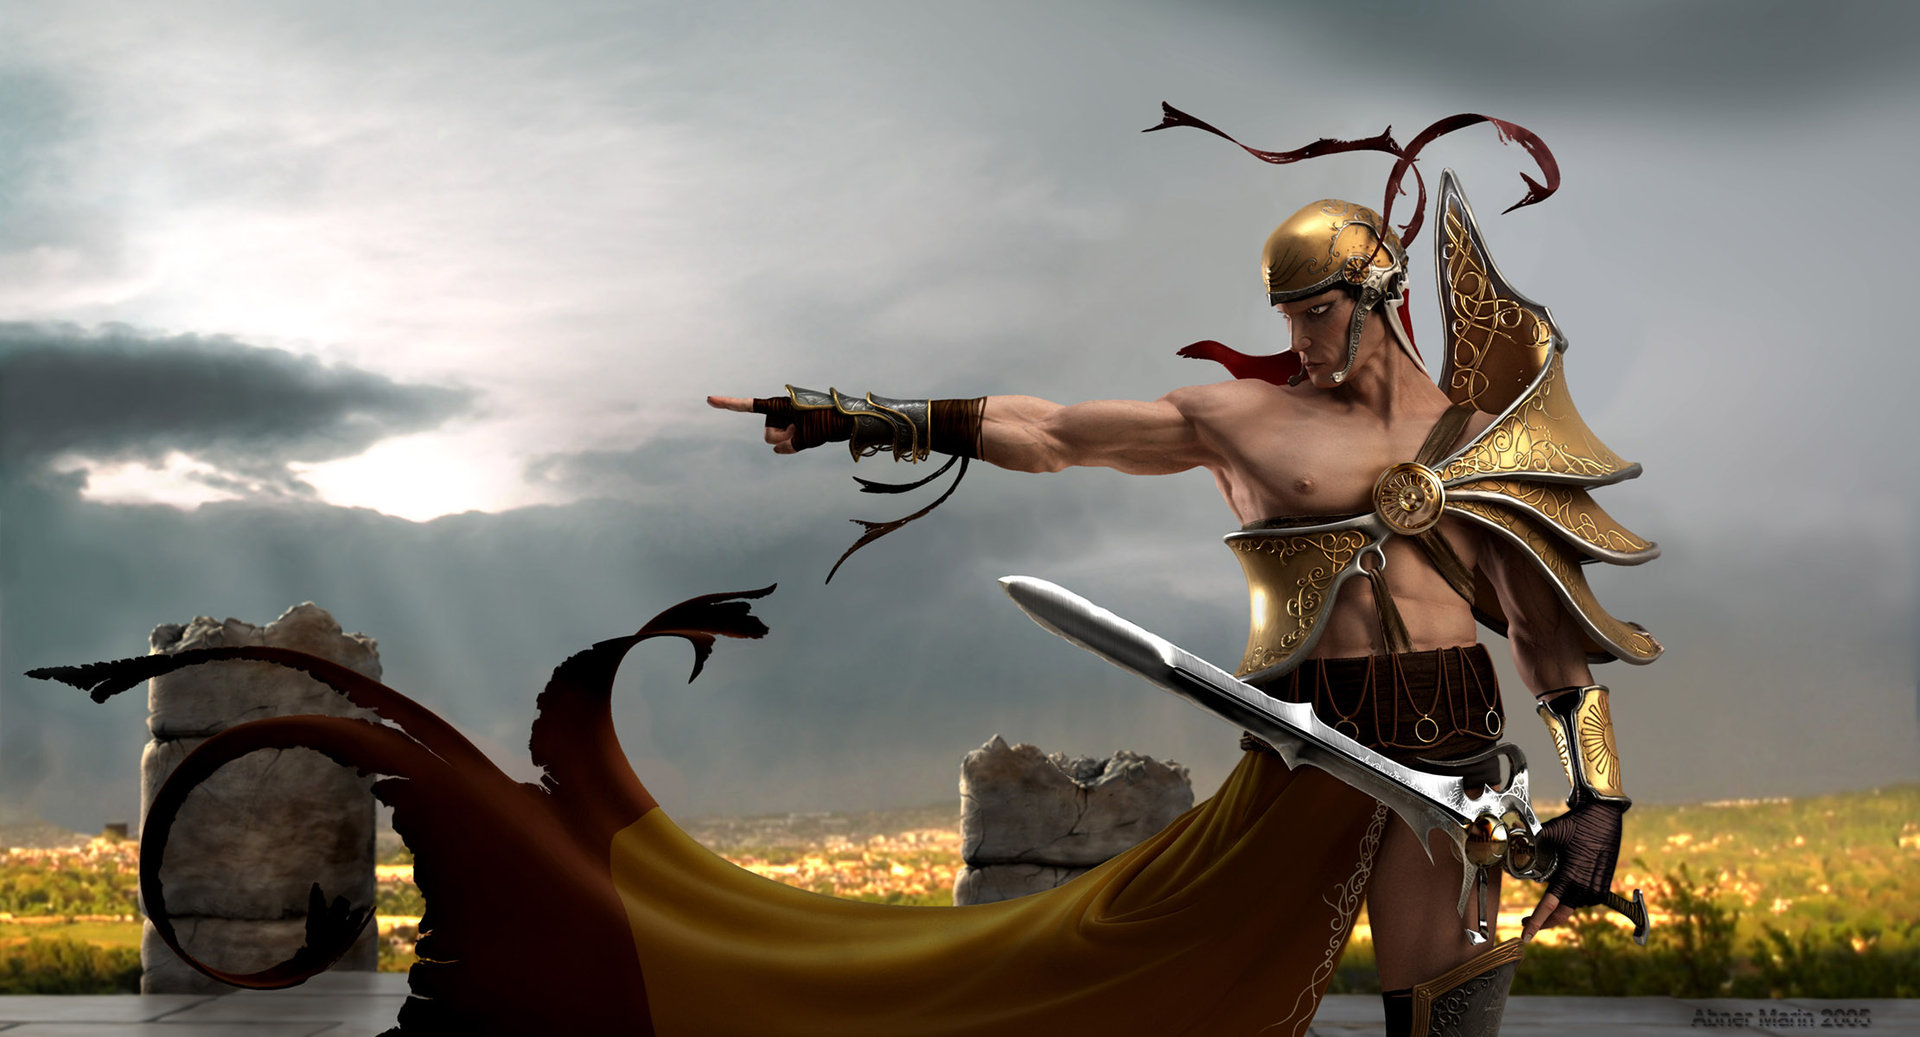 Abner marin swordman 1200